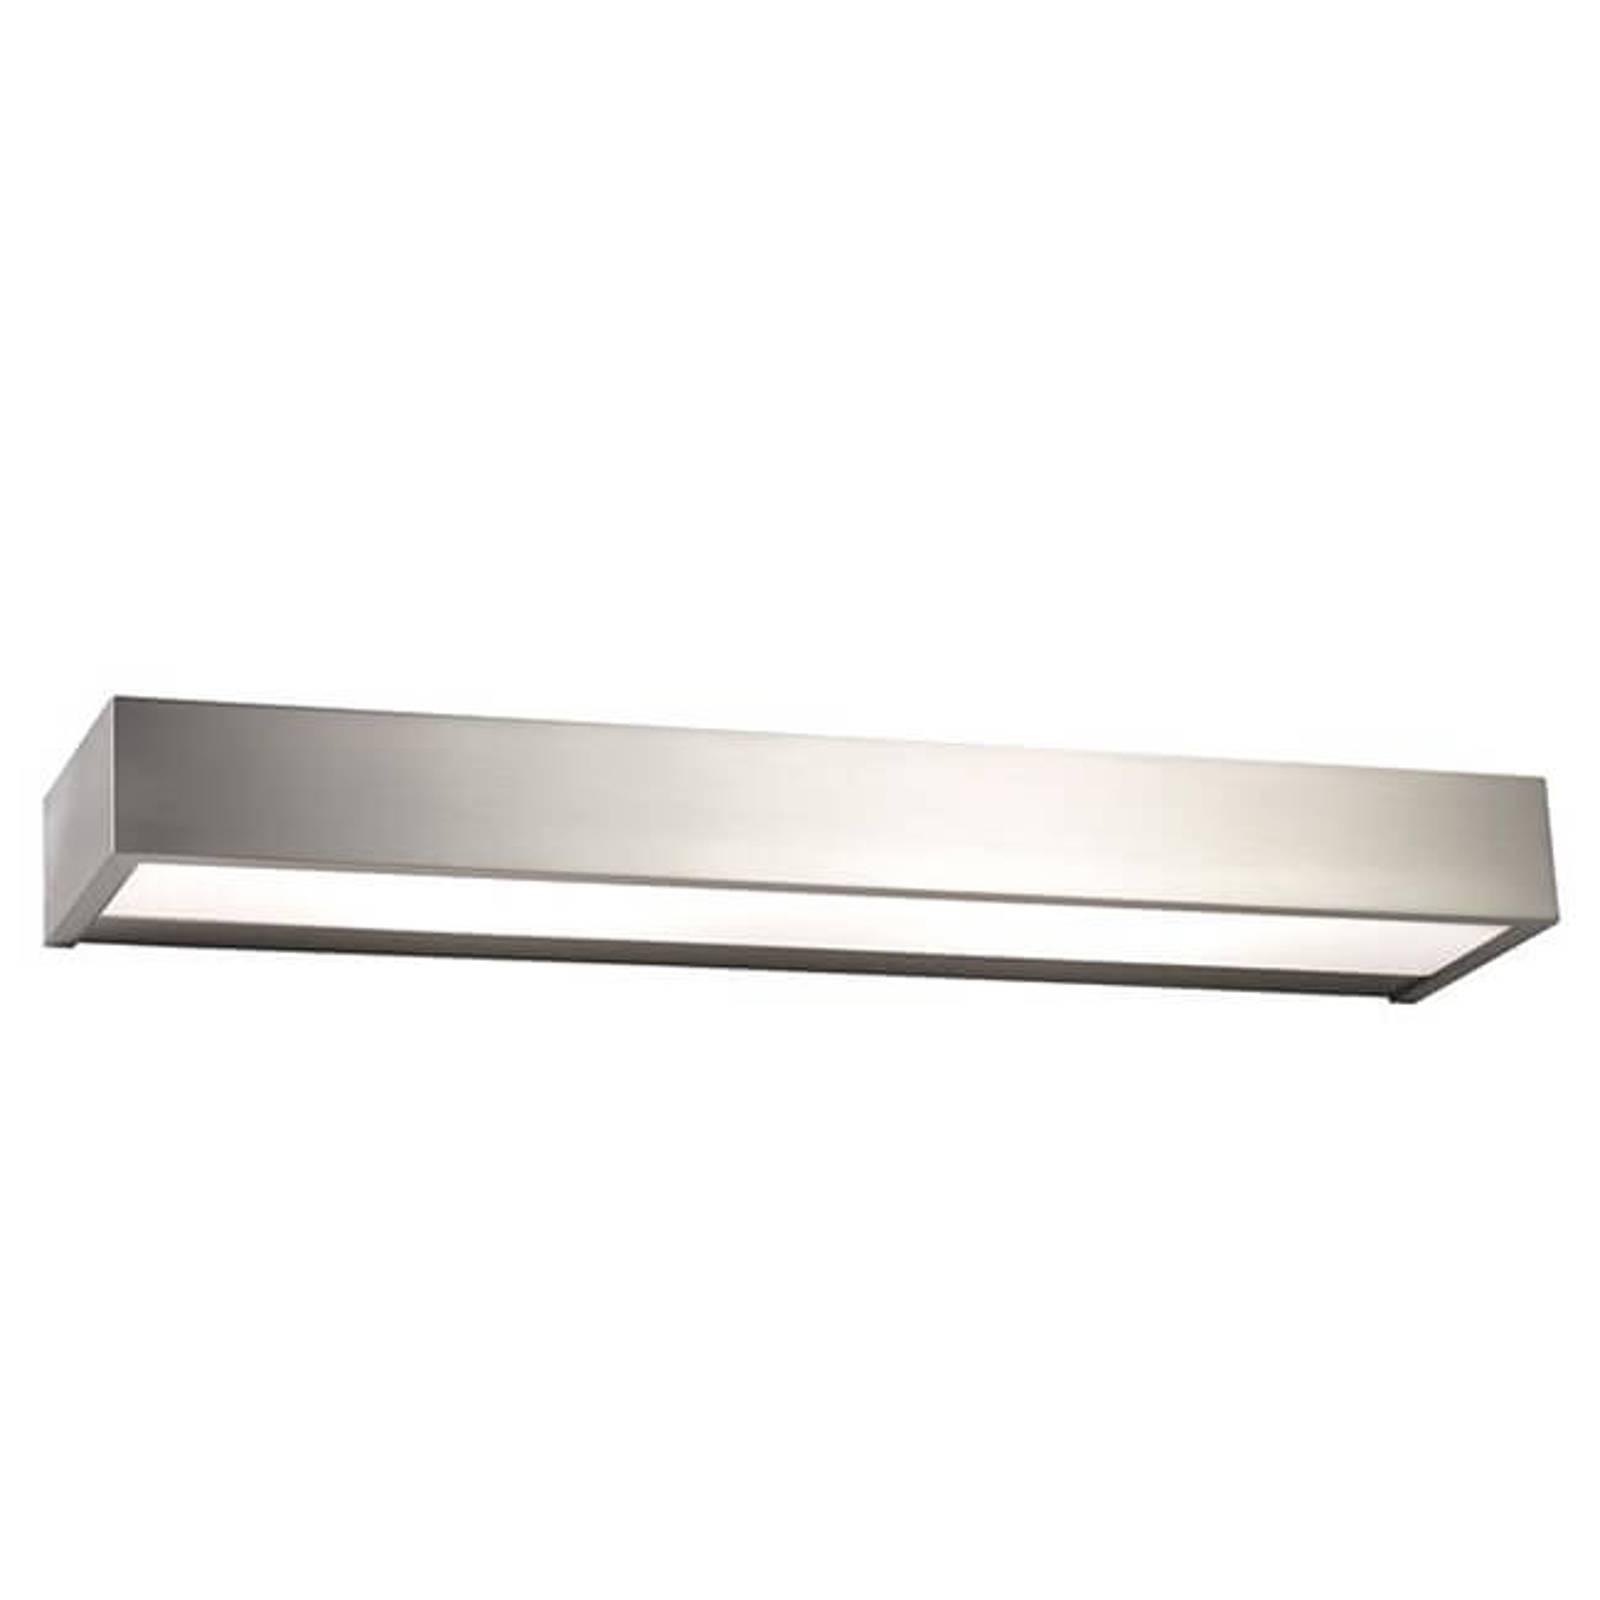 Apolo - LED wandlamp voor de badkamer, 60 cm